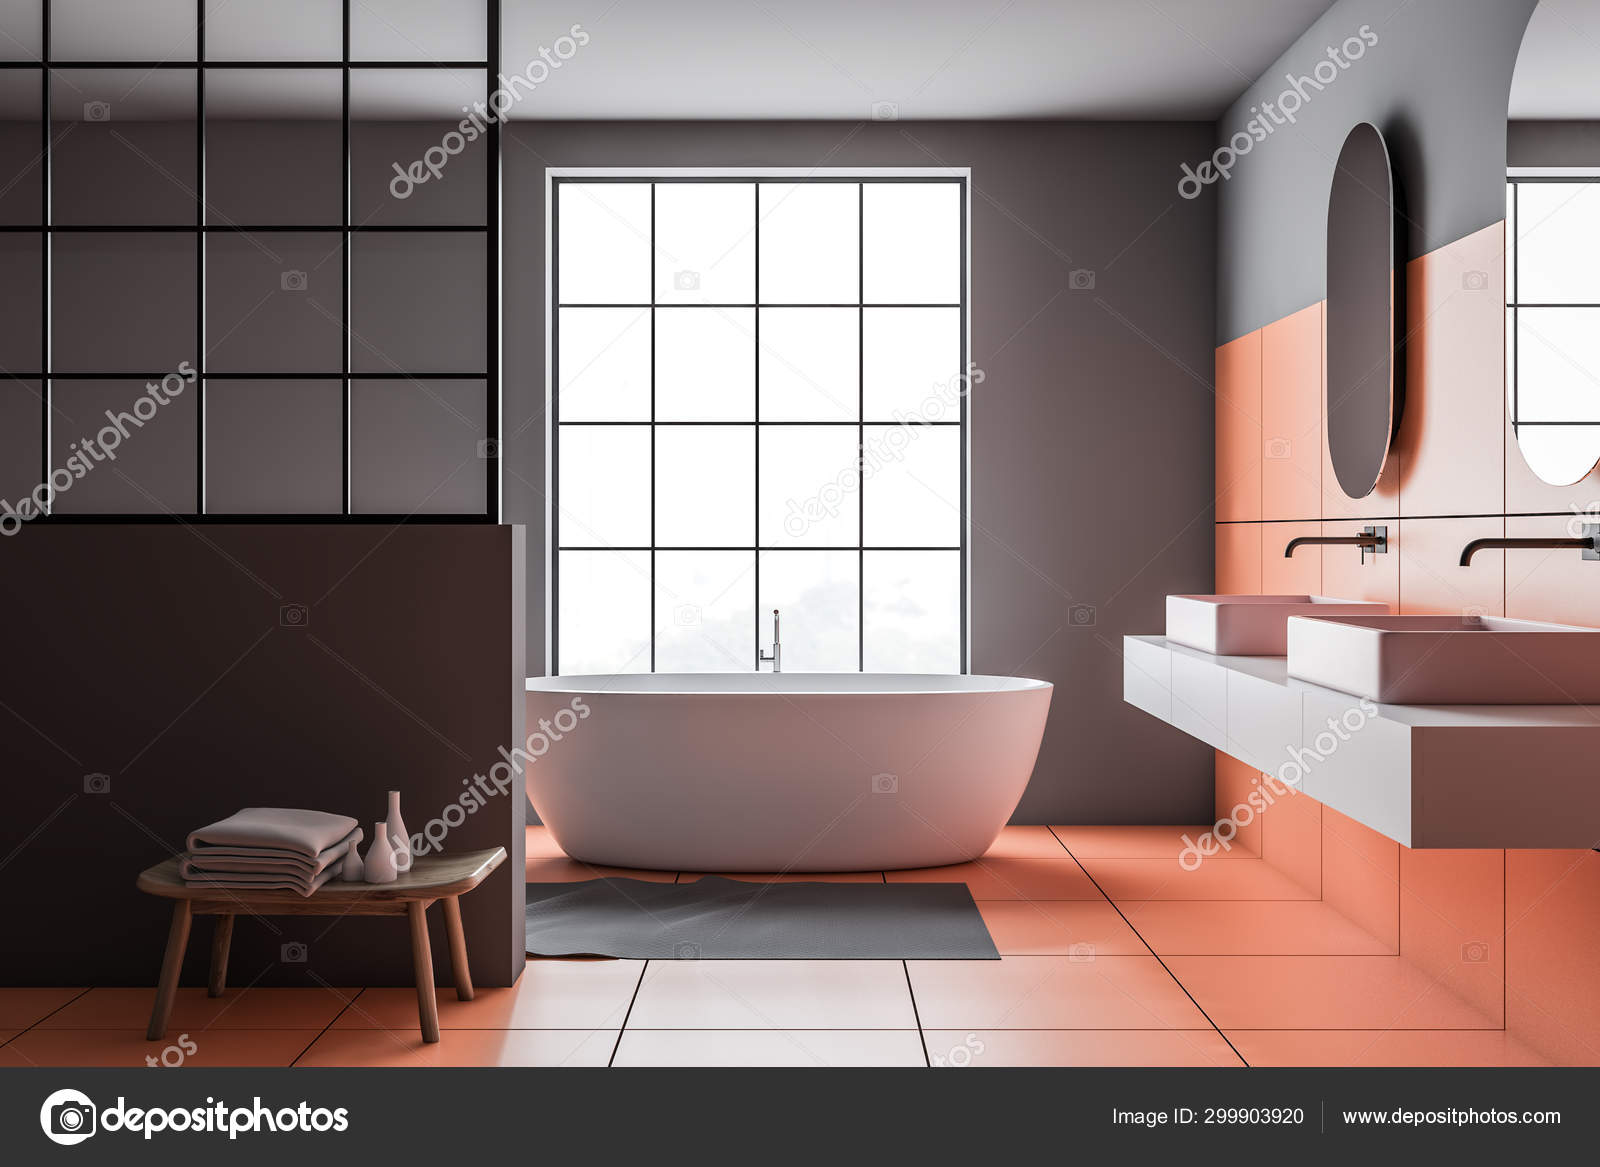 Orange And Gray Bathroom Tub And Sink Stock Photo